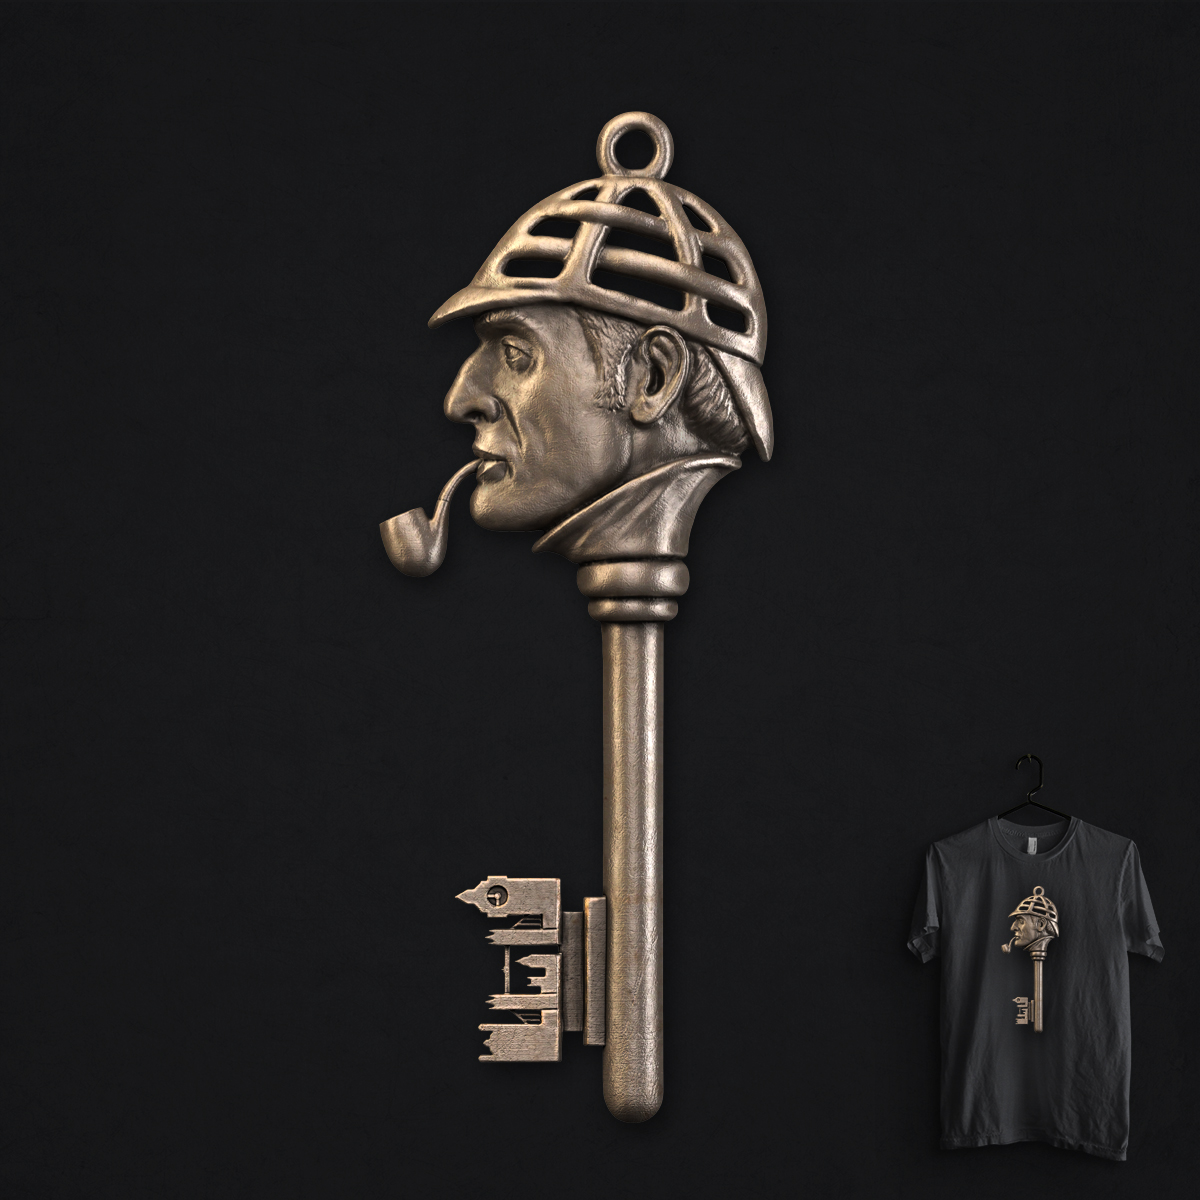 Sherlocksmith by idilek on Threadless